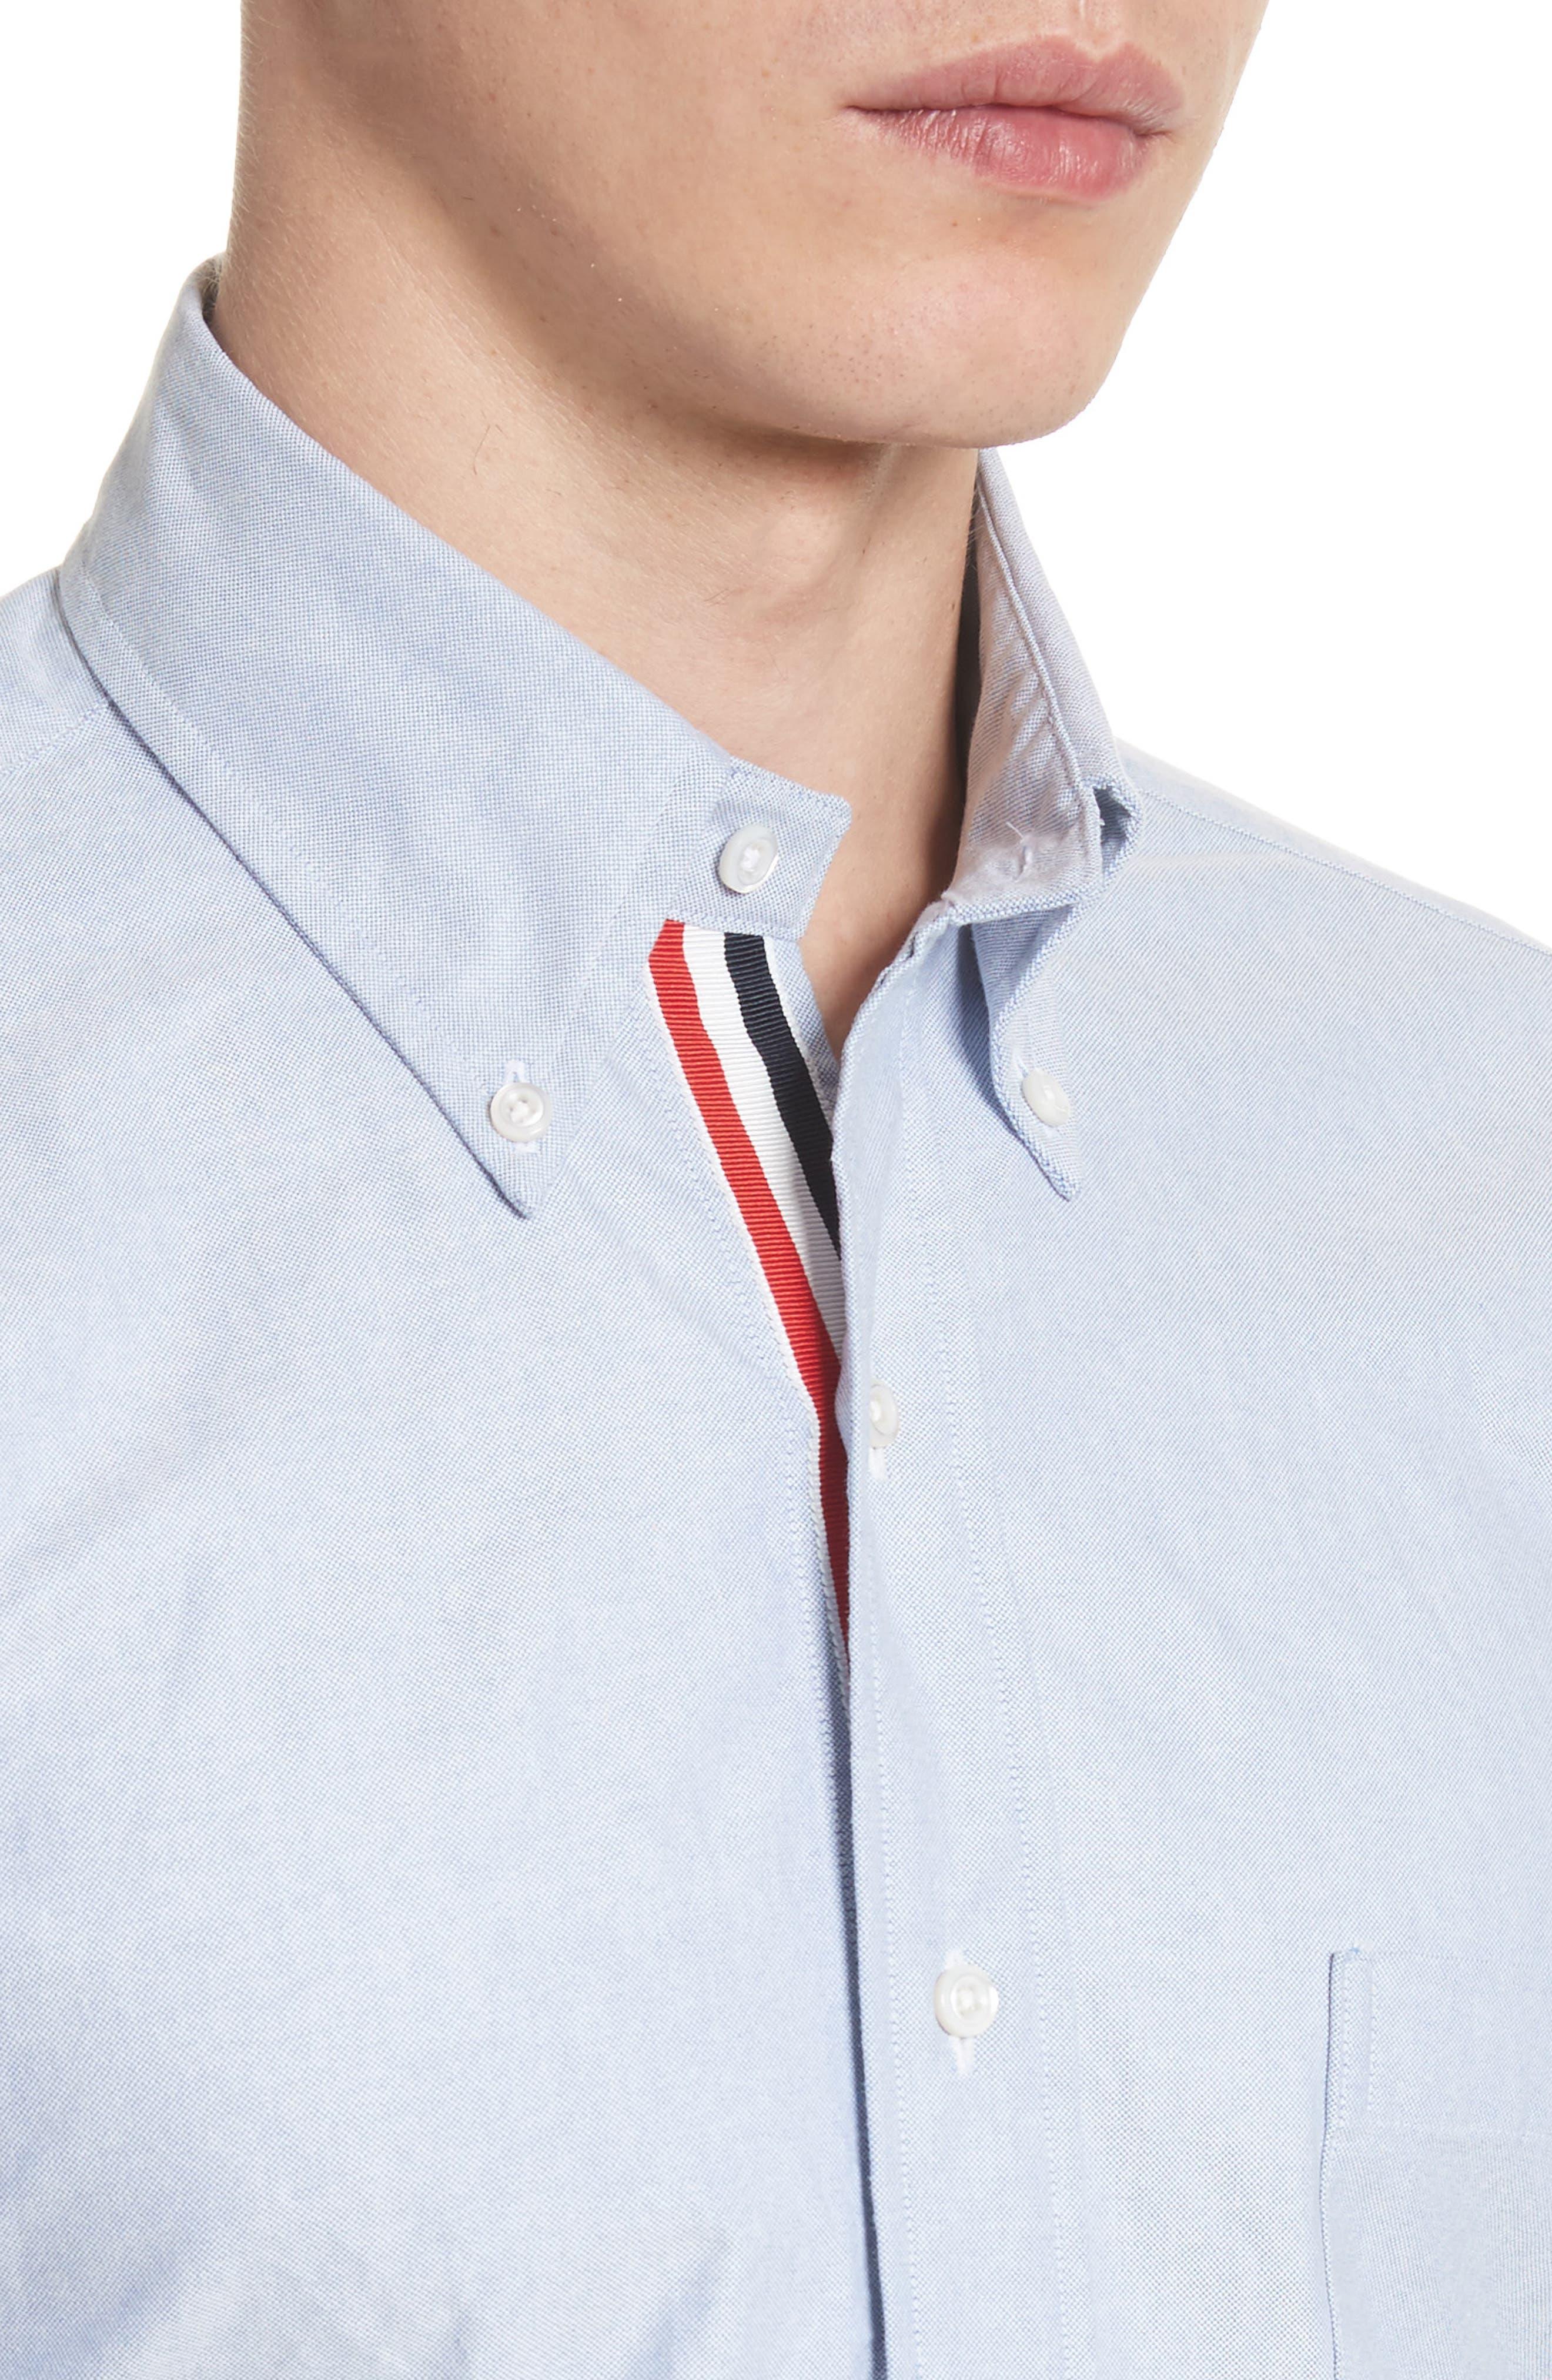 Extra Trim Fit Oxford Shirt with Grosgrain Trim,                             Alternate thumbnail 5, color,                             LIGHT BLUE